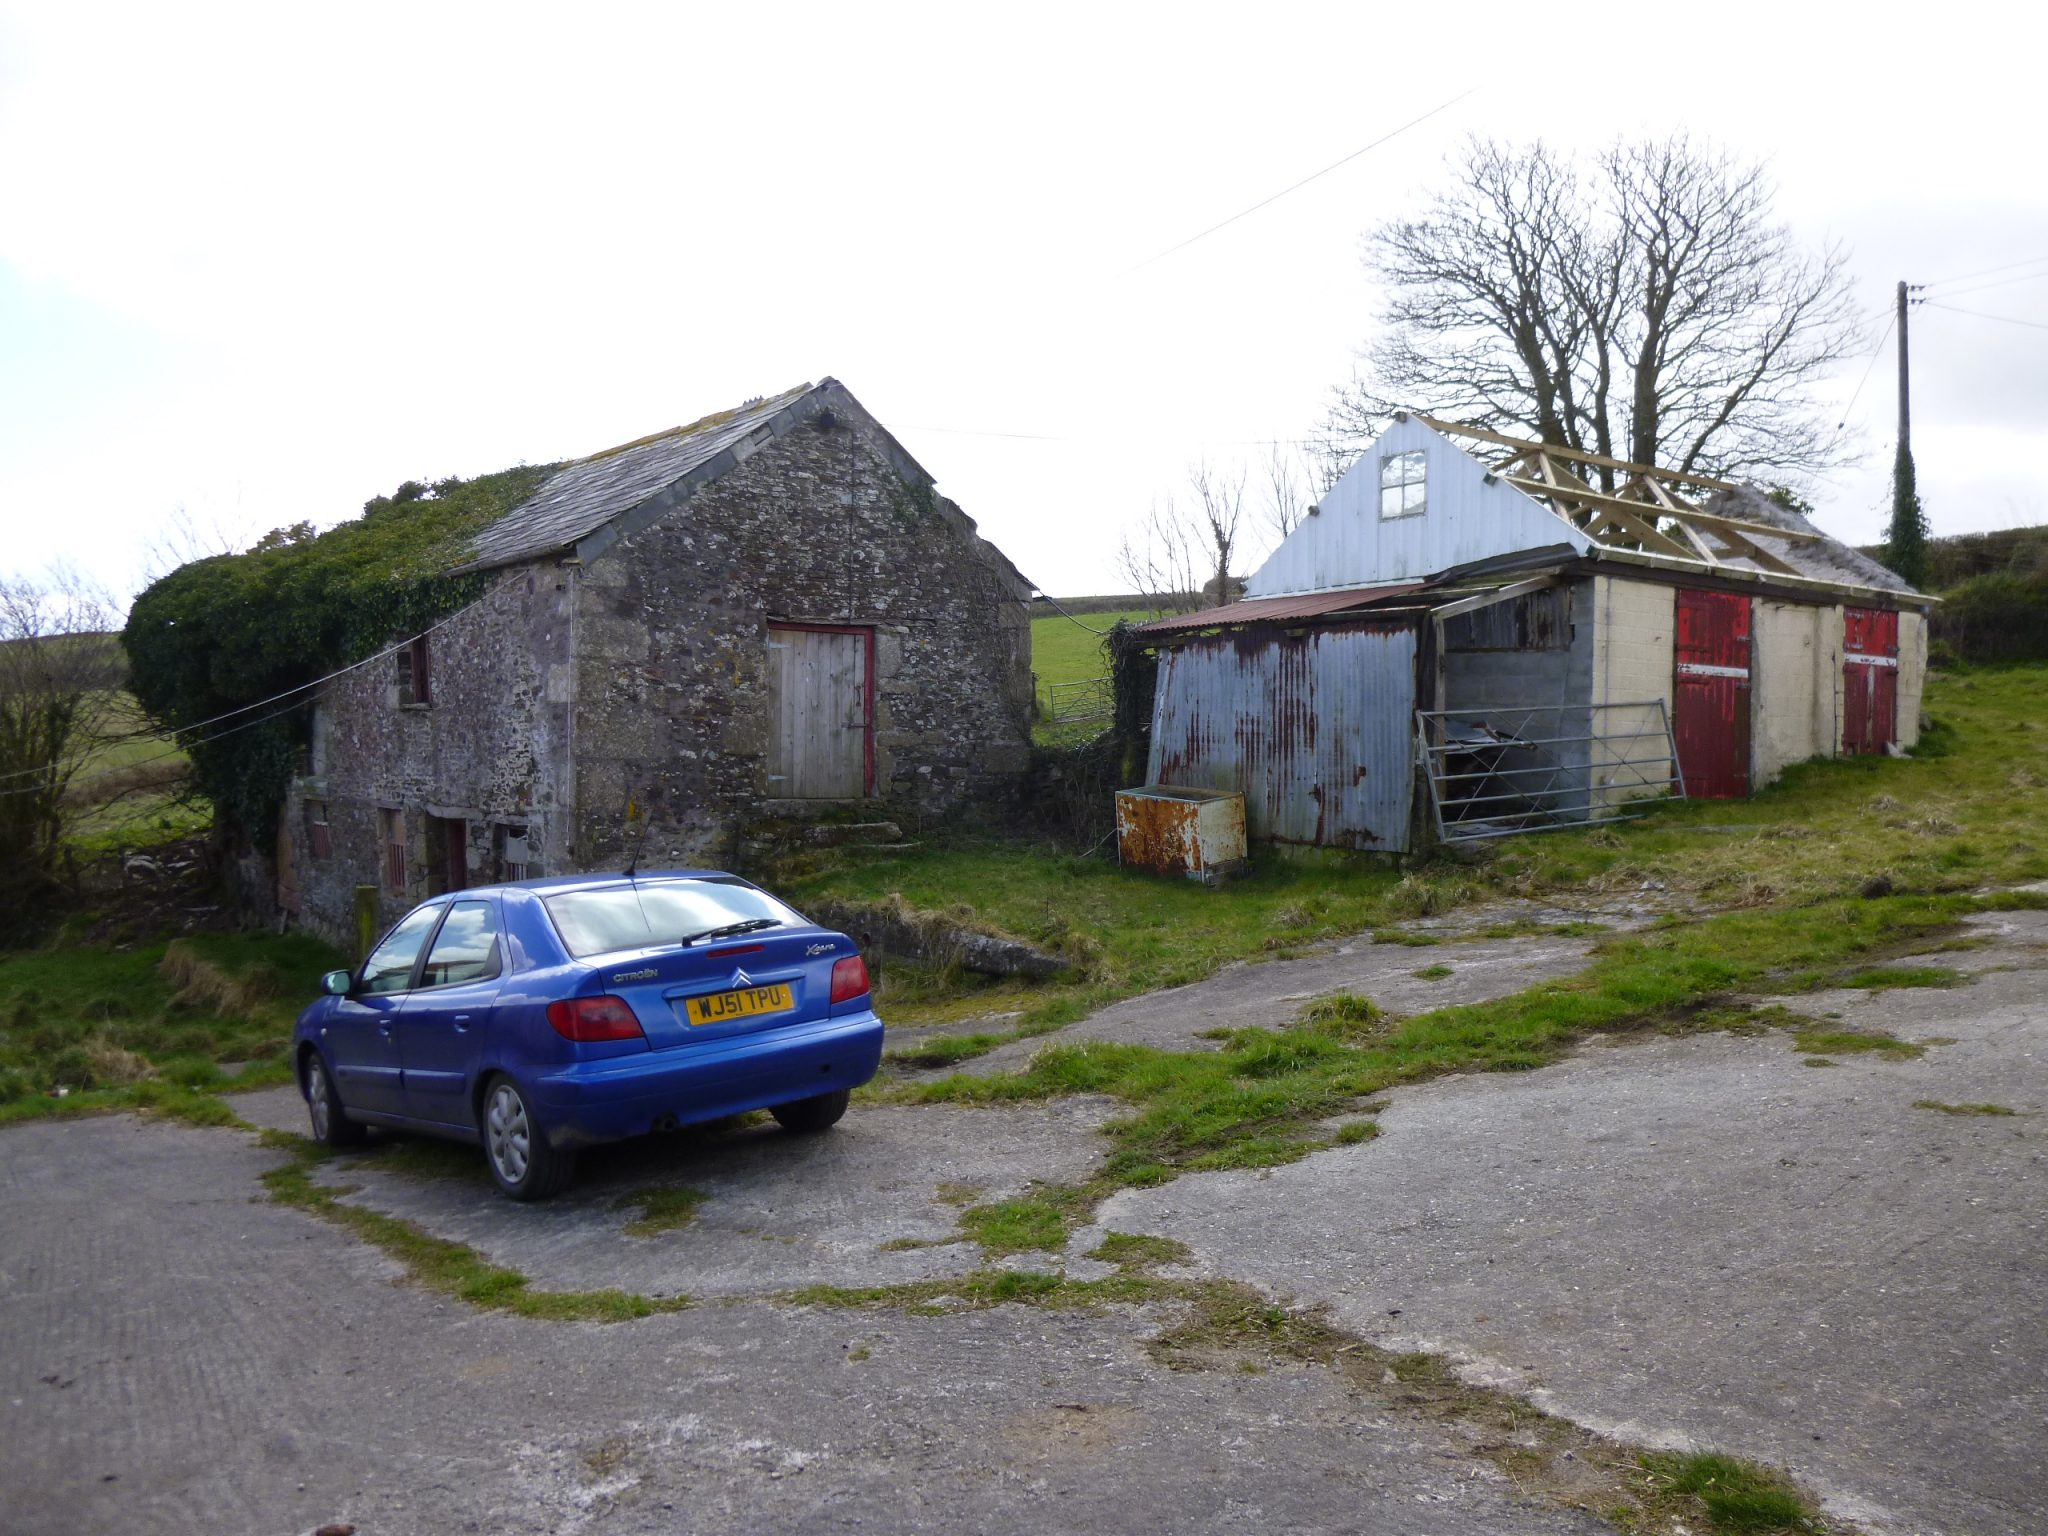 Unconverted barns